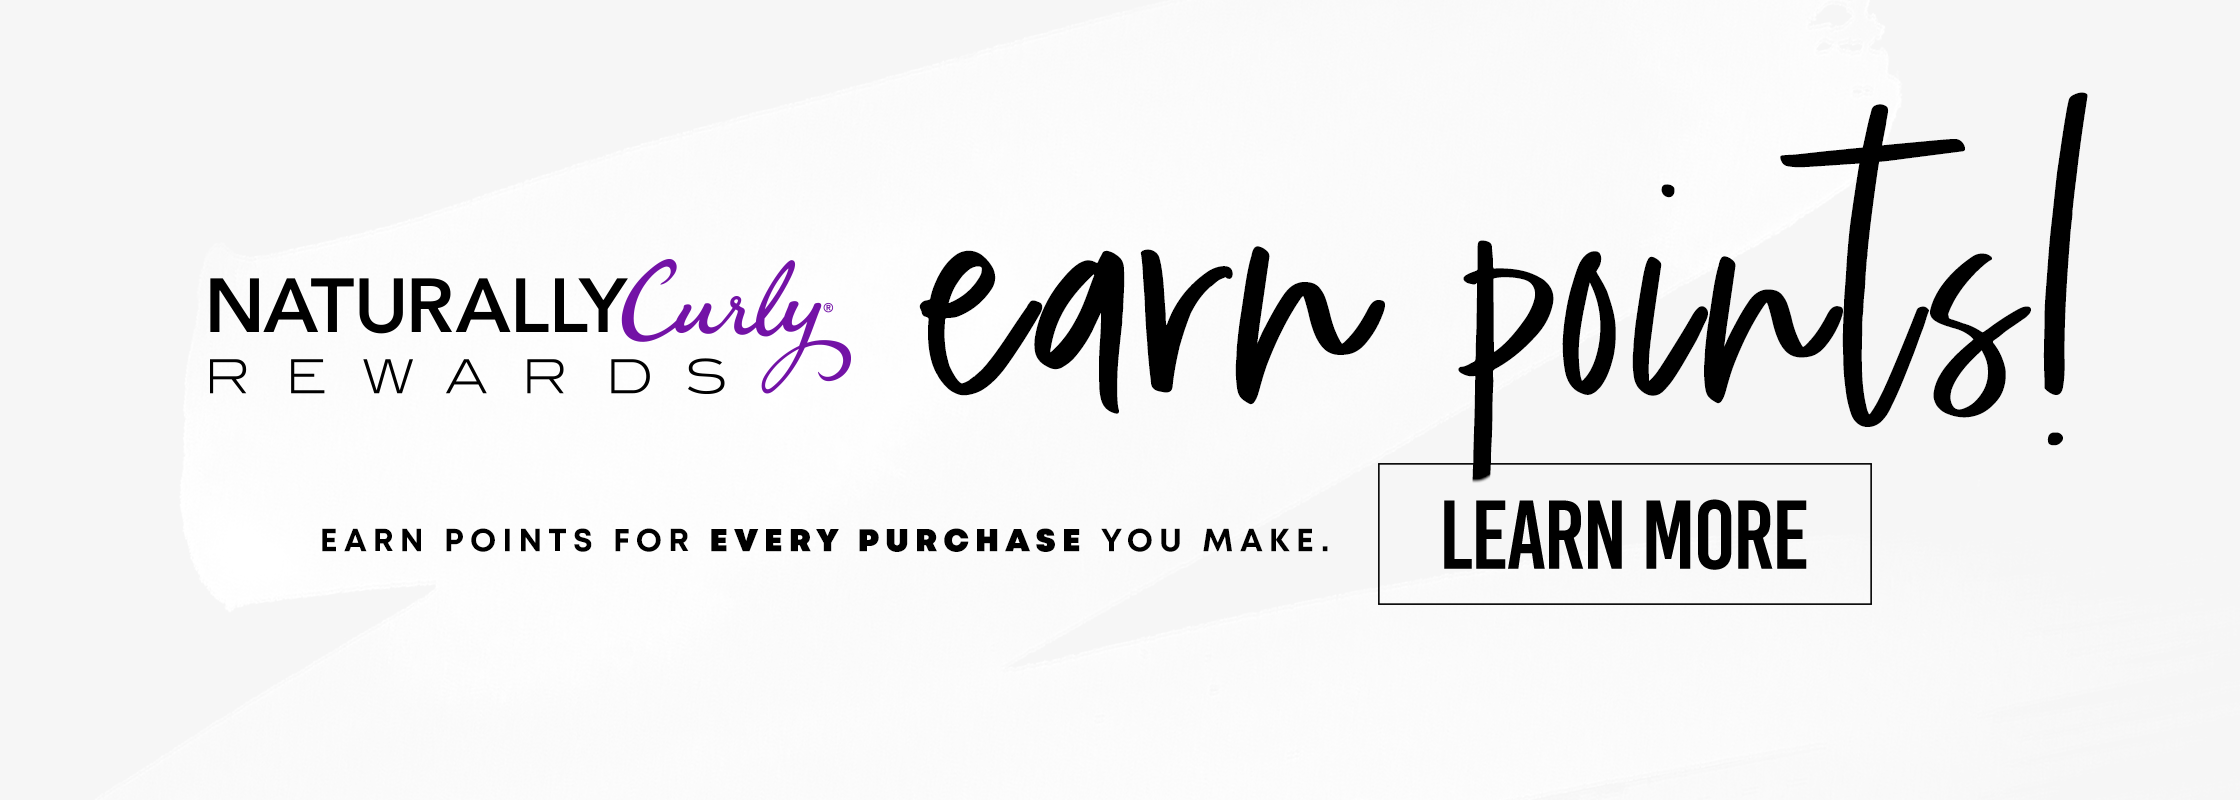 https://shop.naturallycurly.com/product_images/uploaded_images/rewards-mobile.png